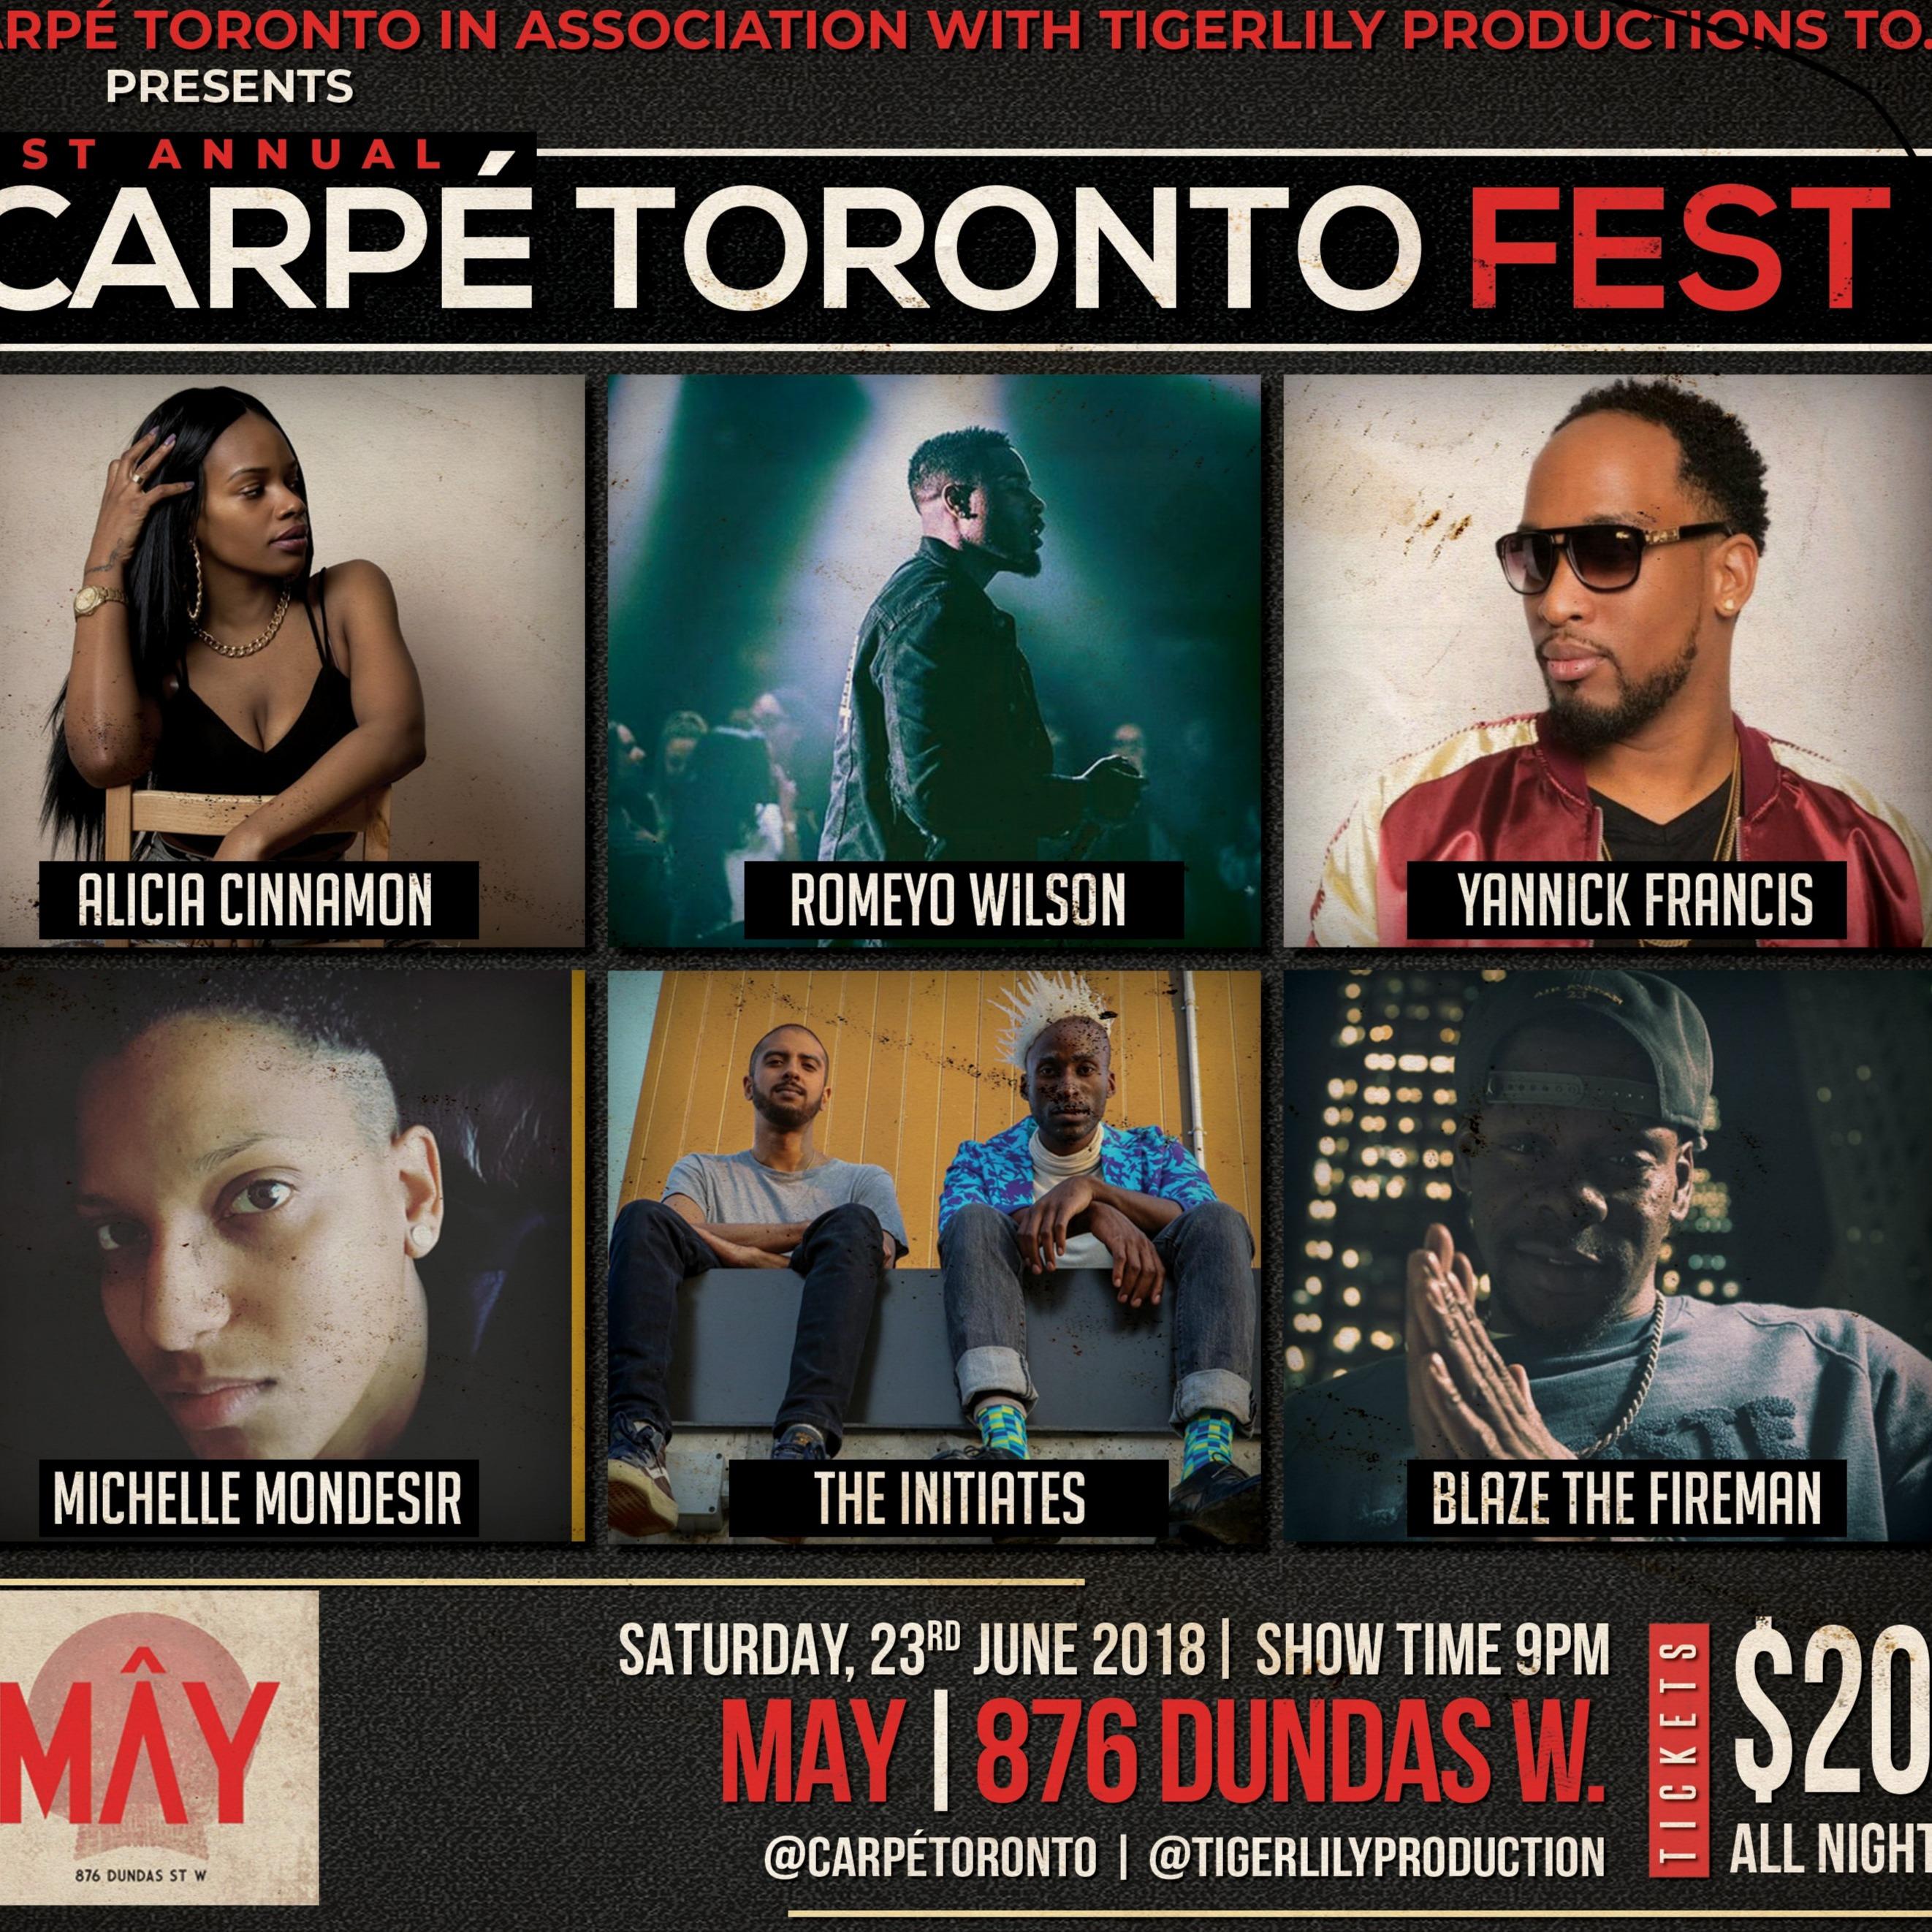 Carpe Toronto Fest